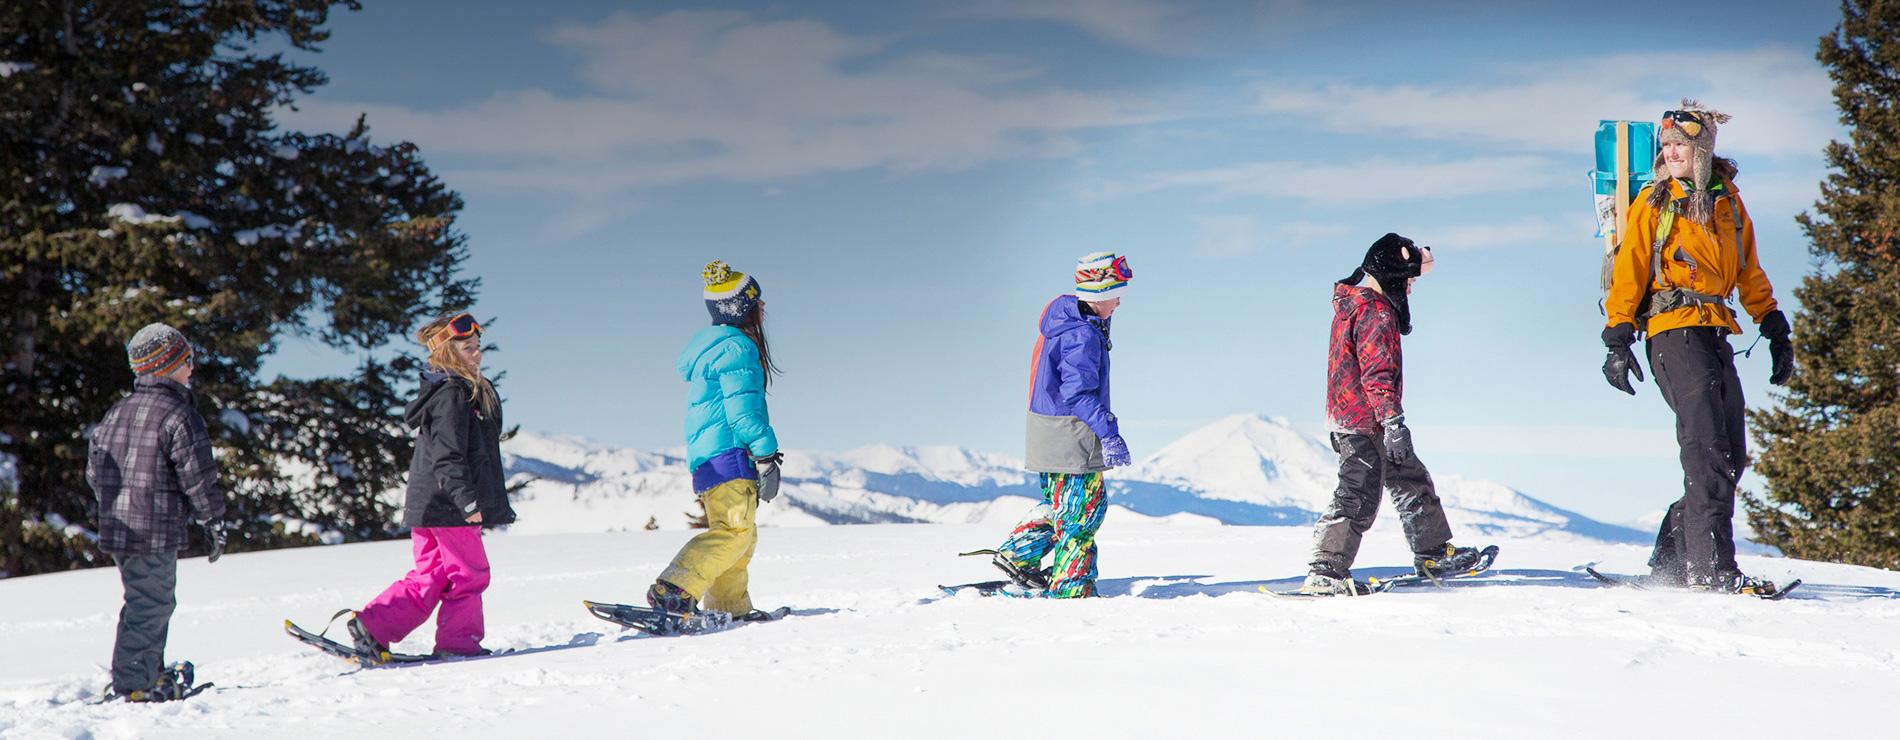 Aspen Family Ski Trip